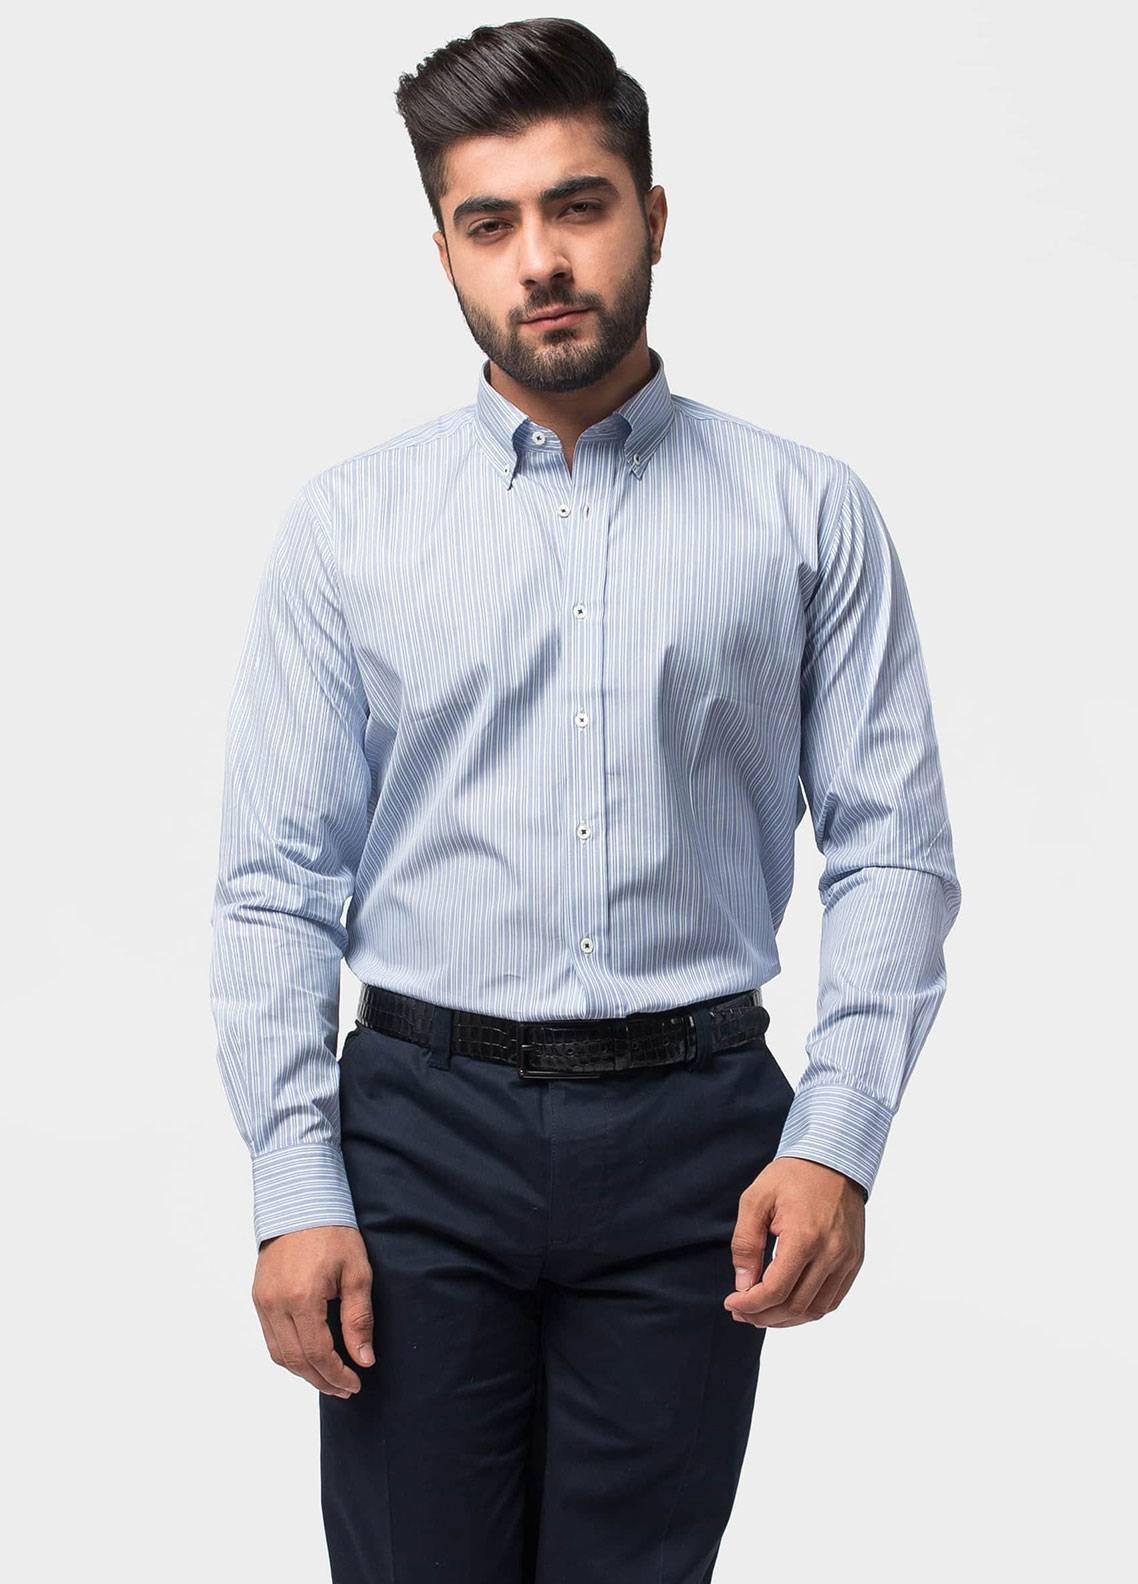 Brumano Cotton Formal Shirts for Men   Blue BRM 497